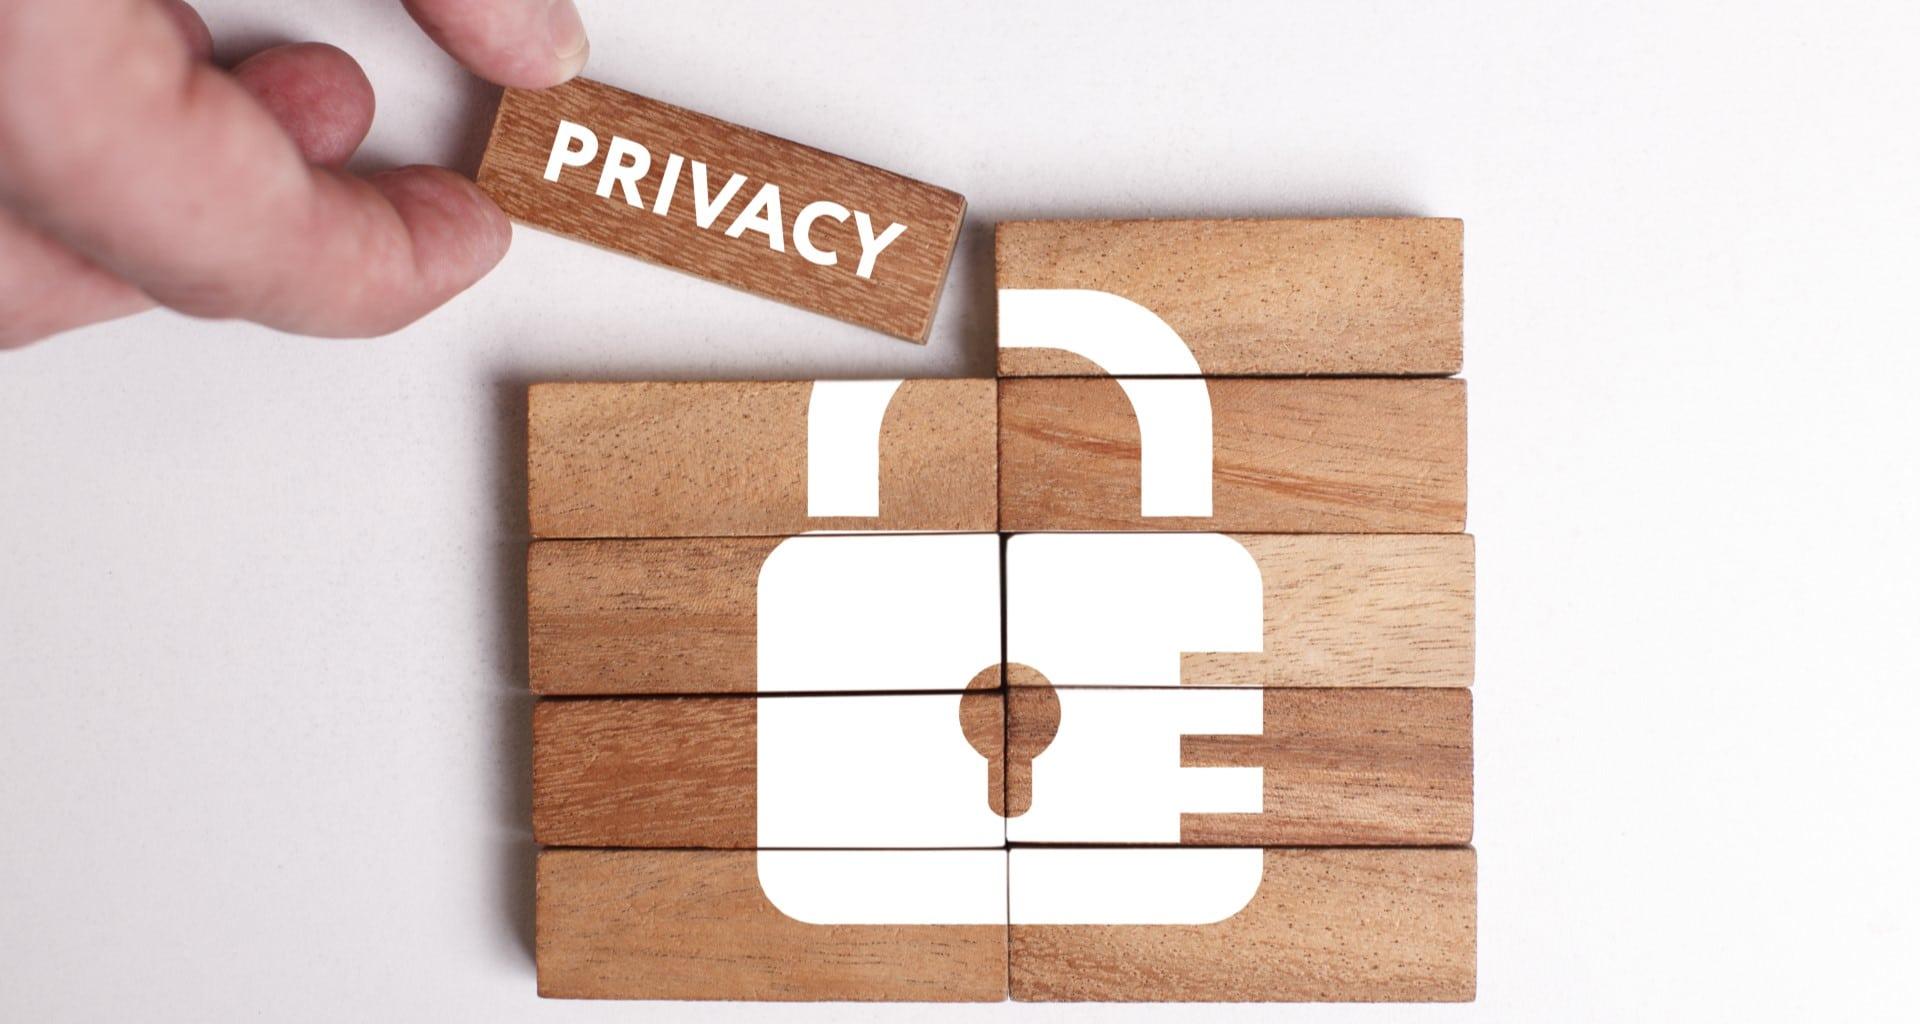 Facebook's main privacy violation problems